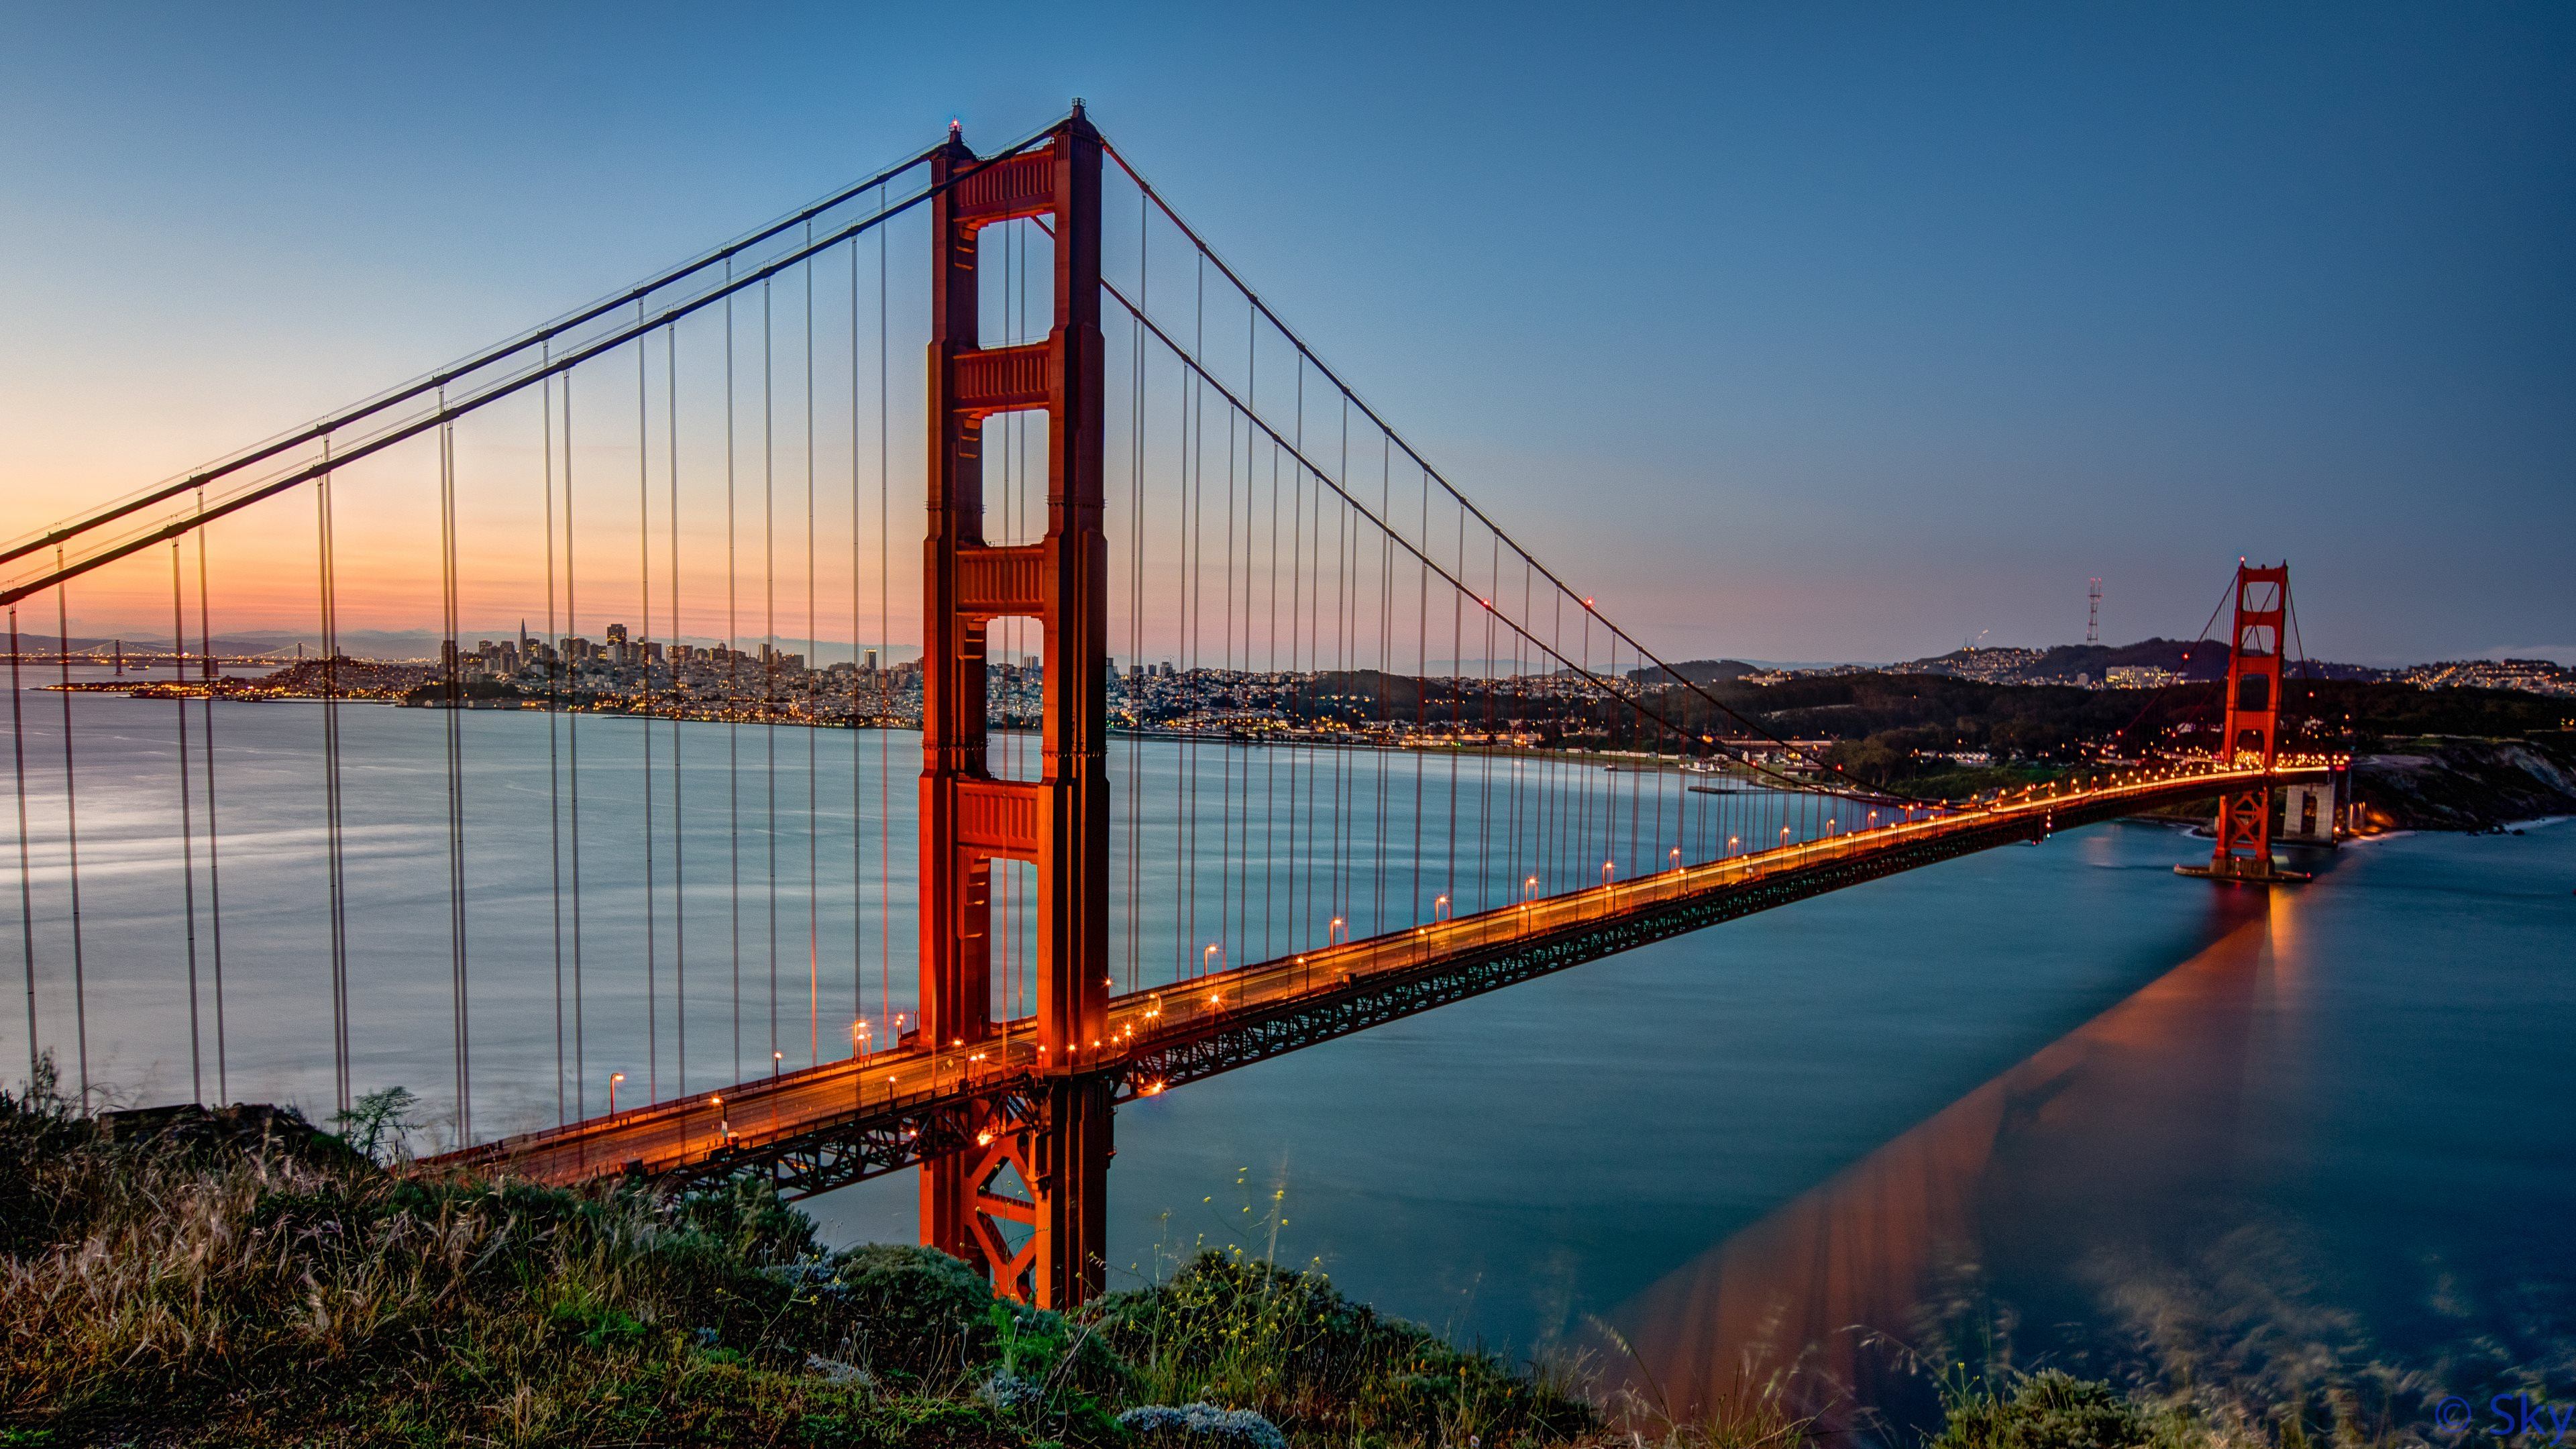 Bridge 4k ultra hd wallpaper and background image - Bridge wallpaper hd ...